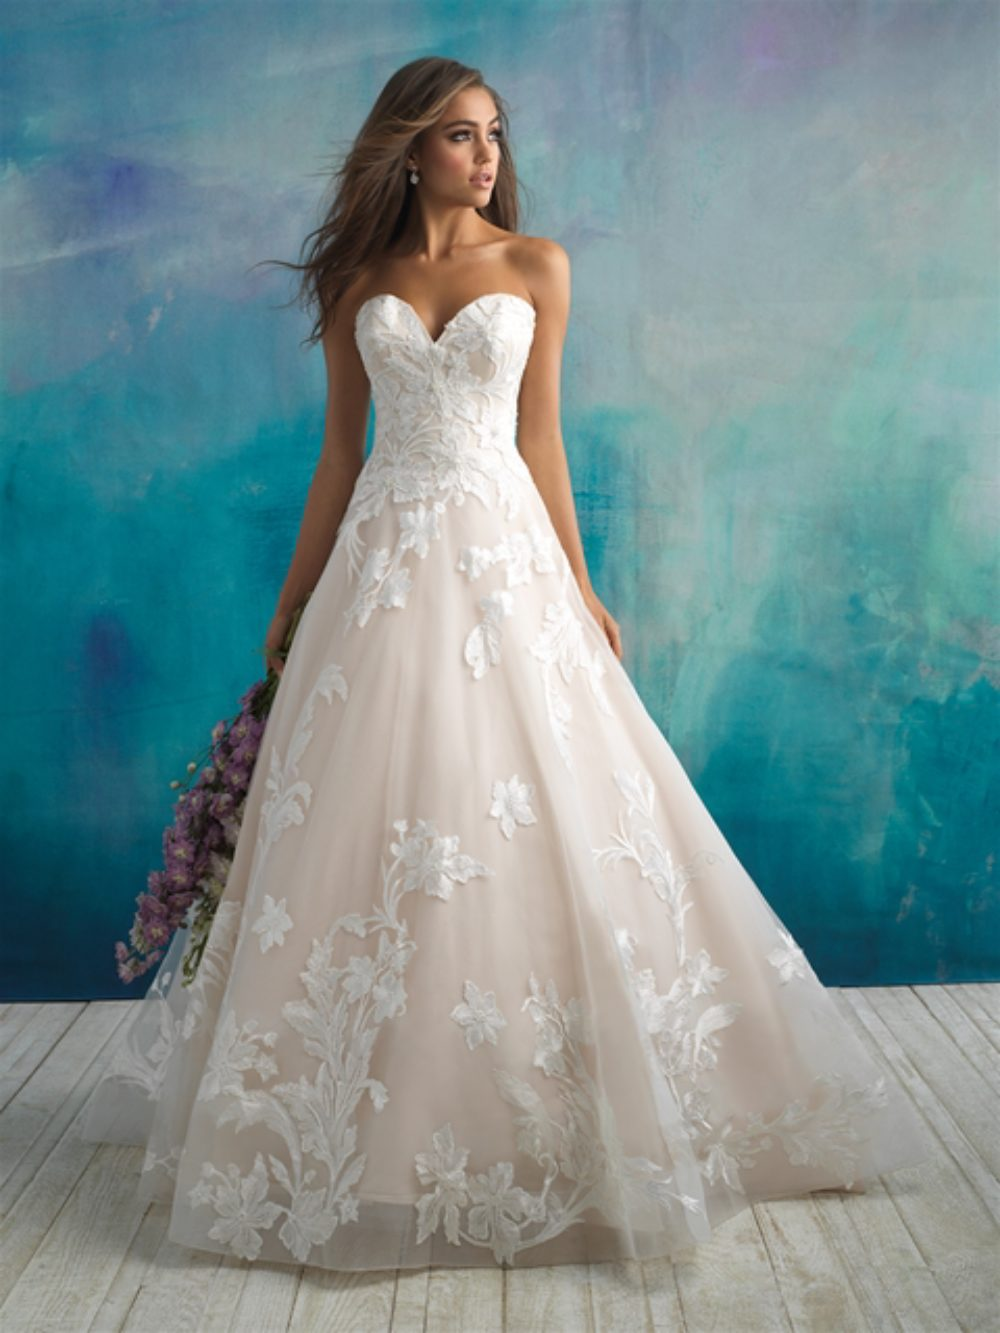 Allure and Allure Couture Wedding Dresses at Precious Memories